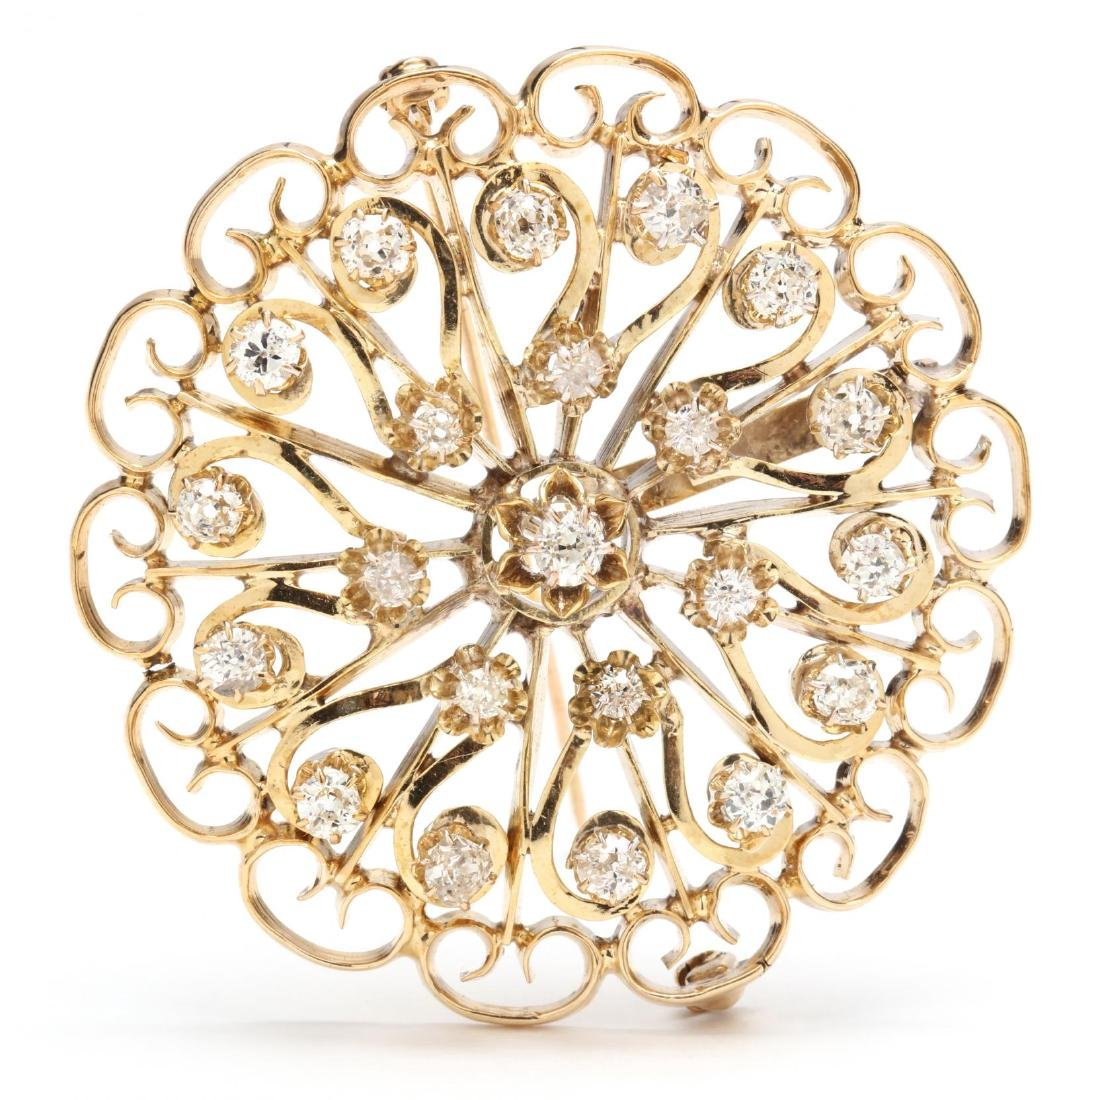 14KT Gold and Diamond Brooch / Pendant